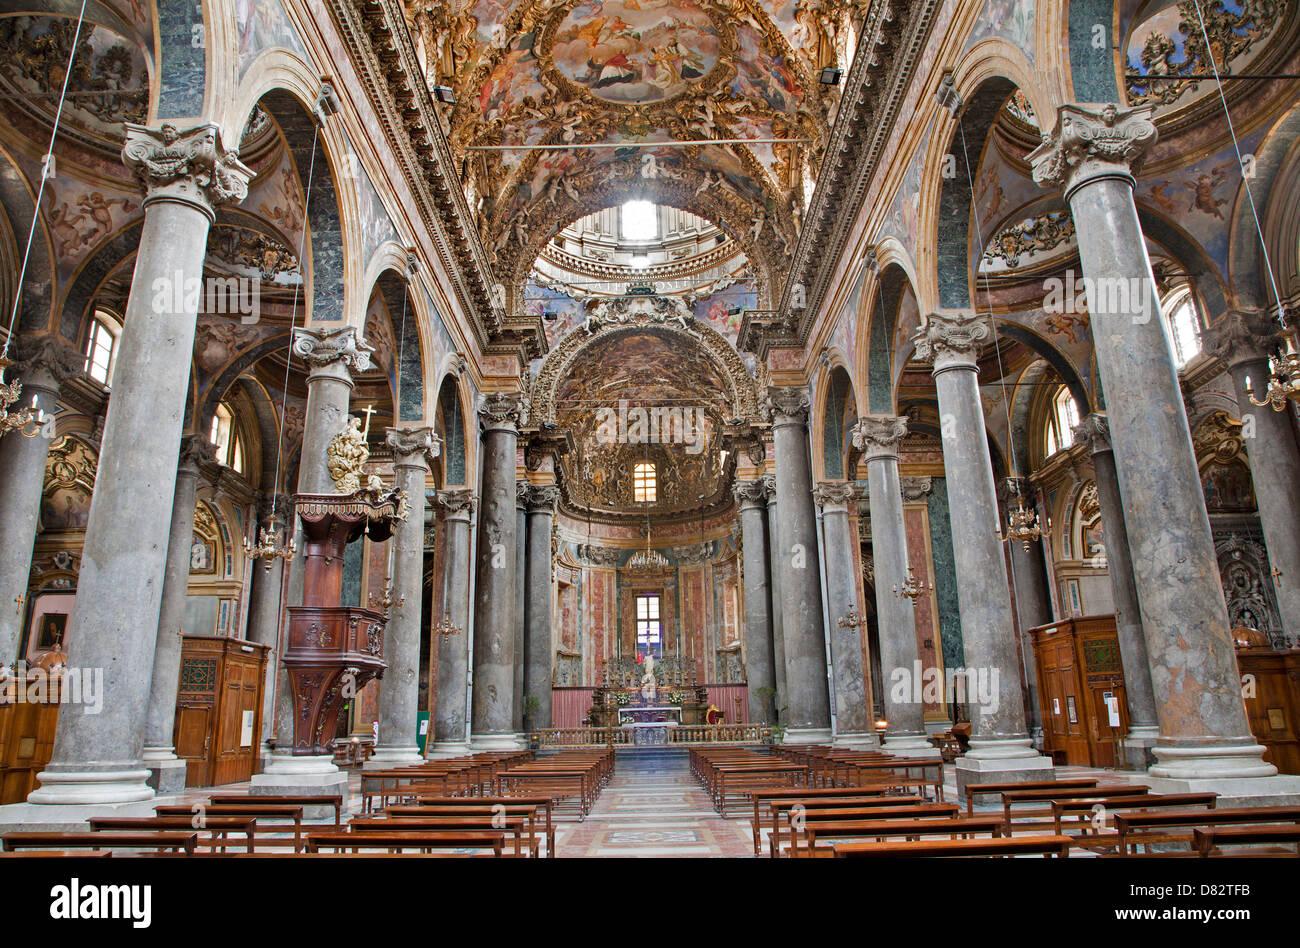 PALERMO - APRIL 8: Interior from baroque church of San Giuseppe dei Teatini April 8, 2013 in Palermo, Italy. - Stock Image